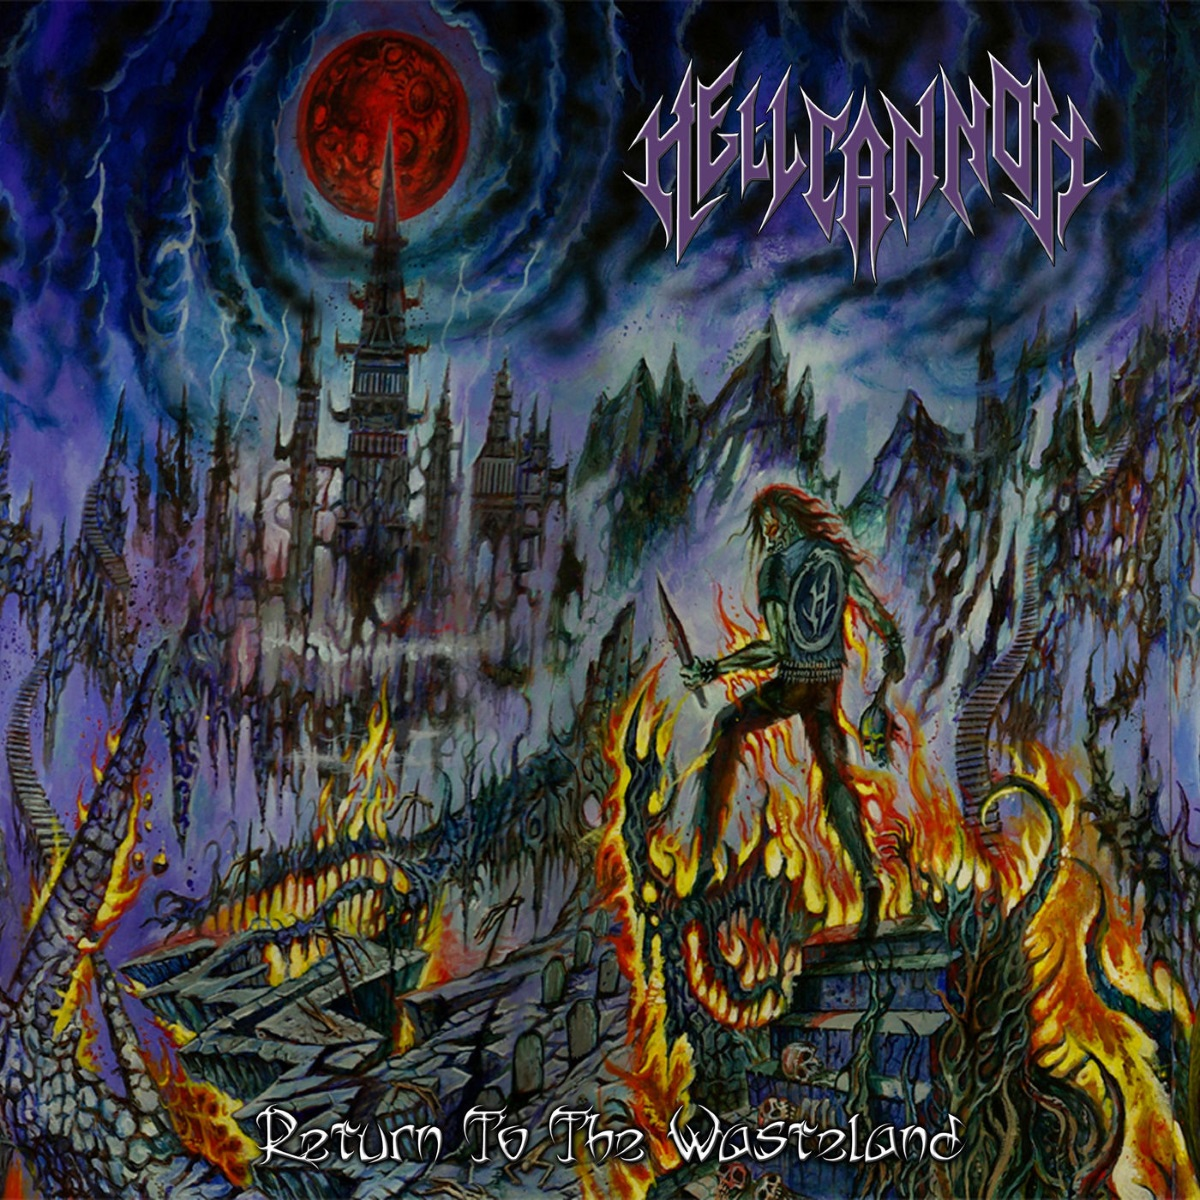 hellcannon return to wasteland